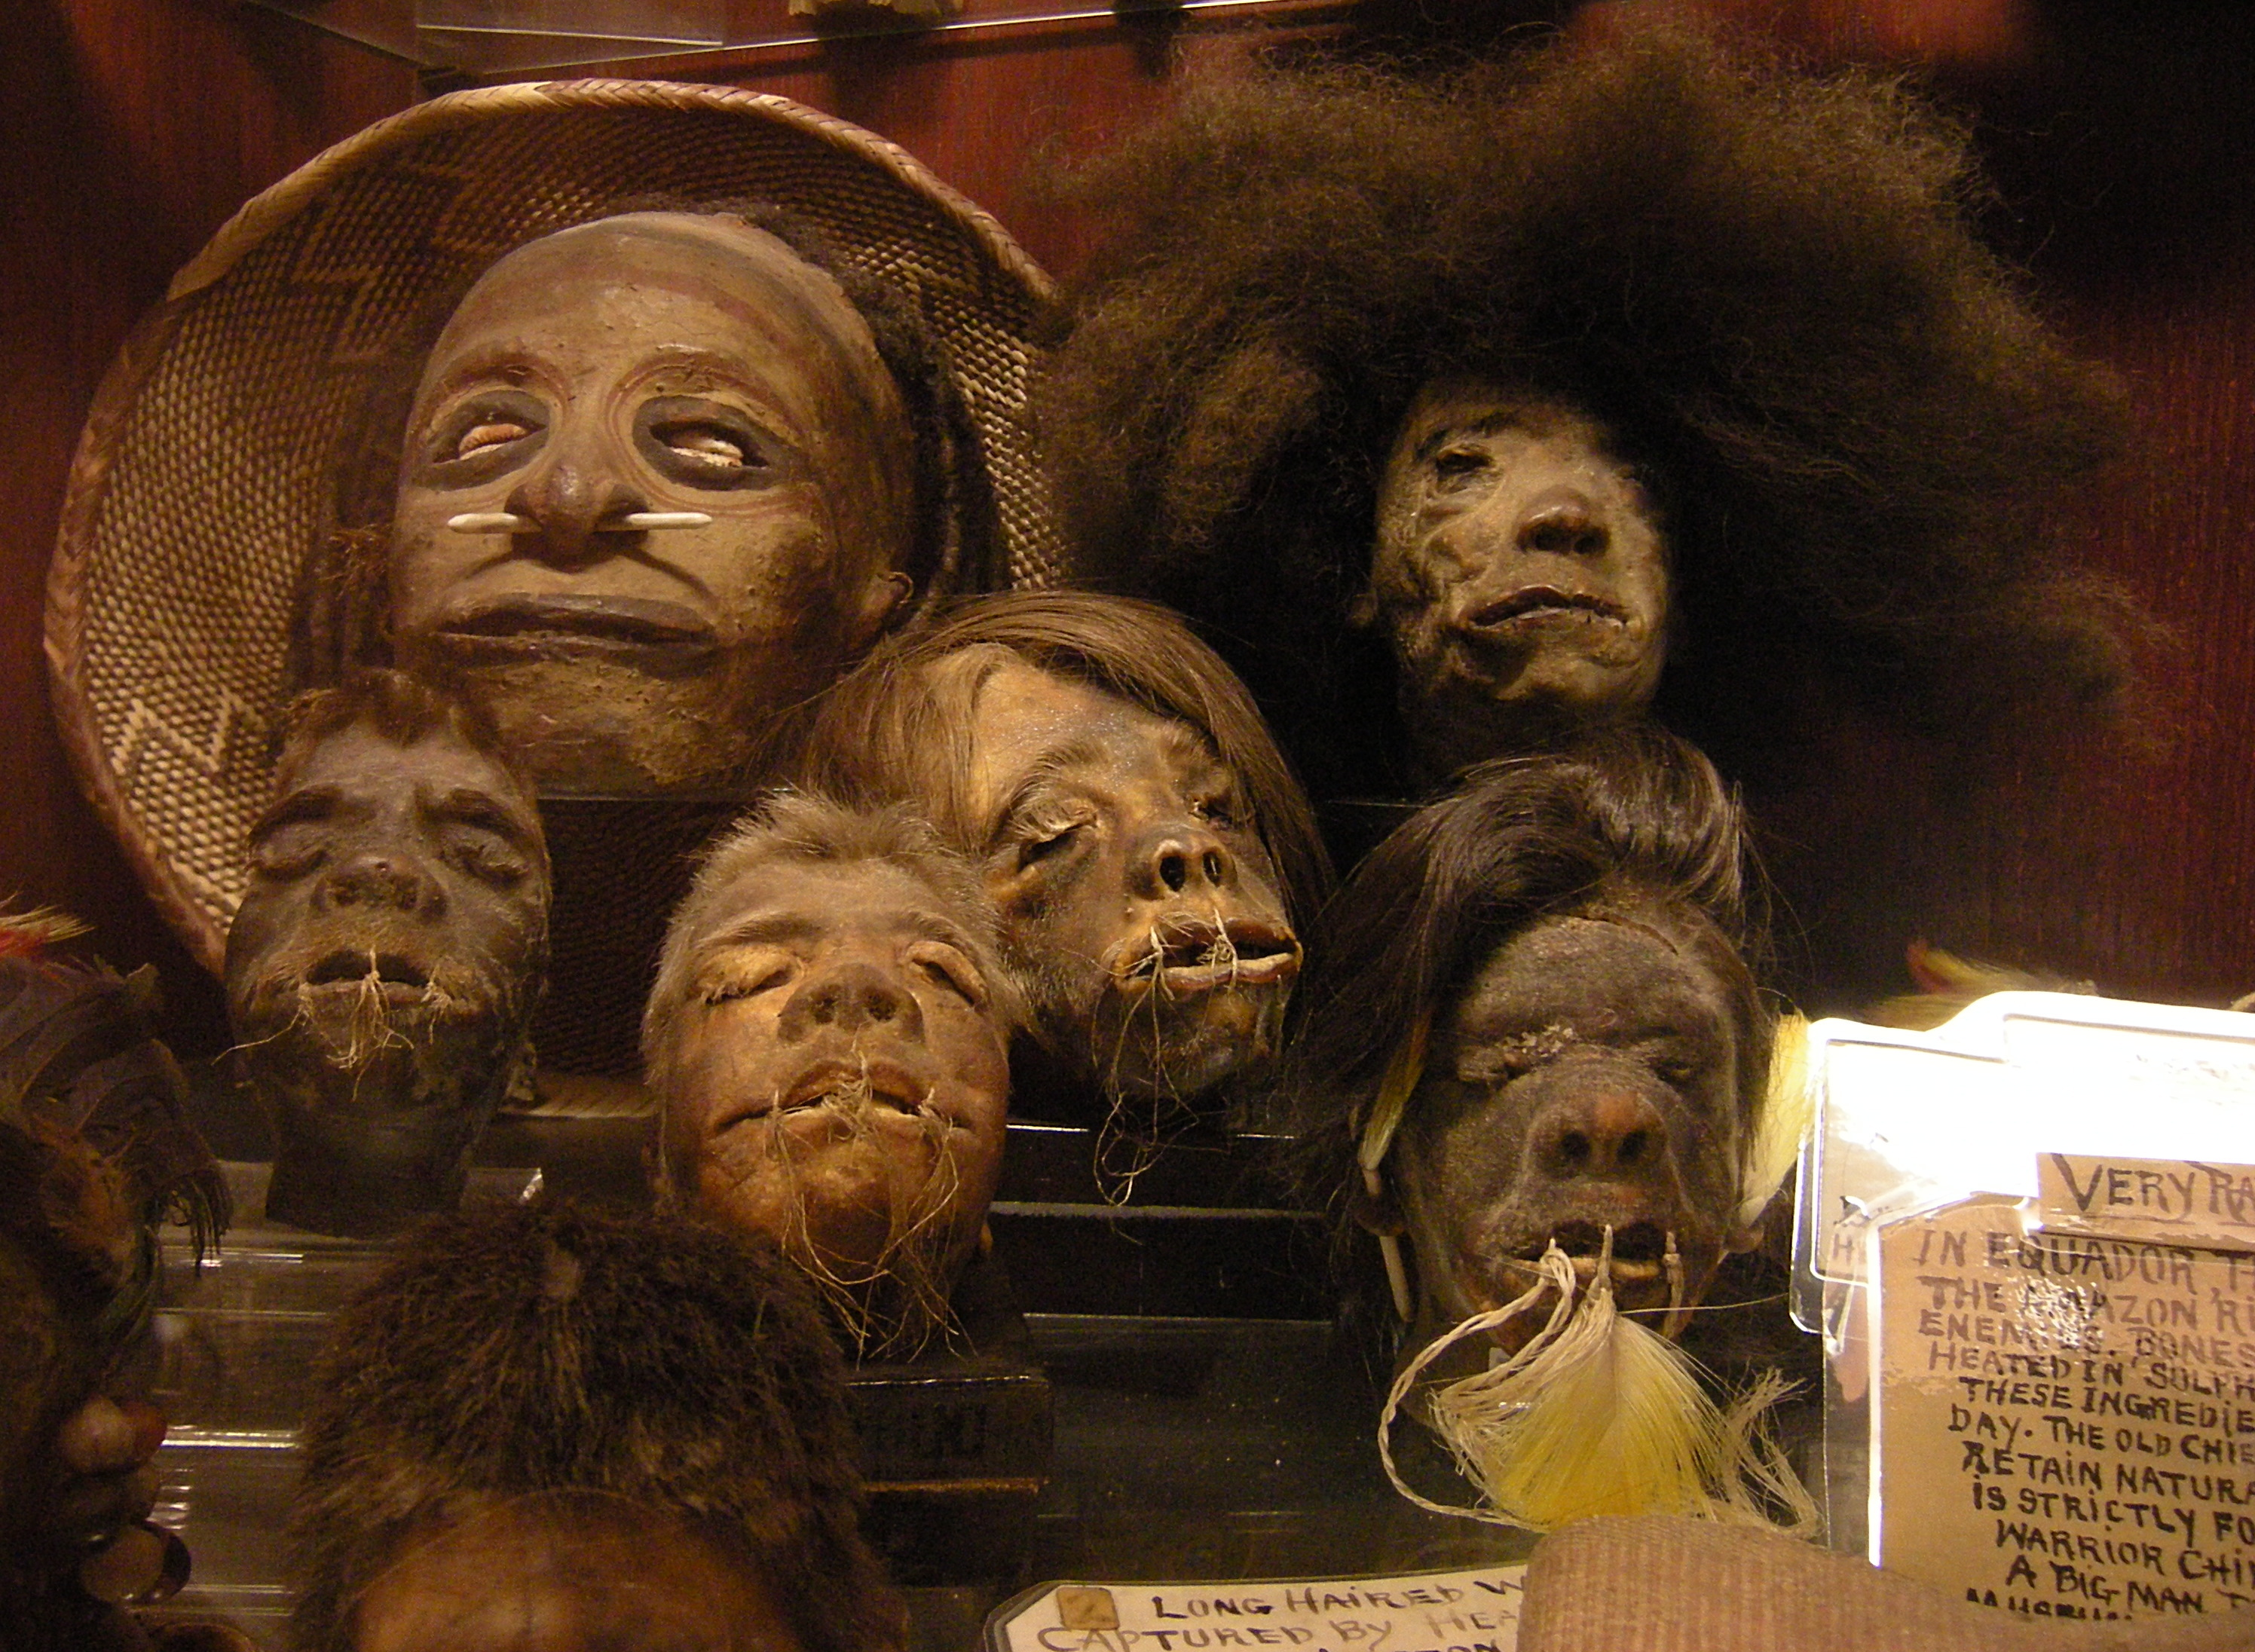 Shrunken head - Wikipedia